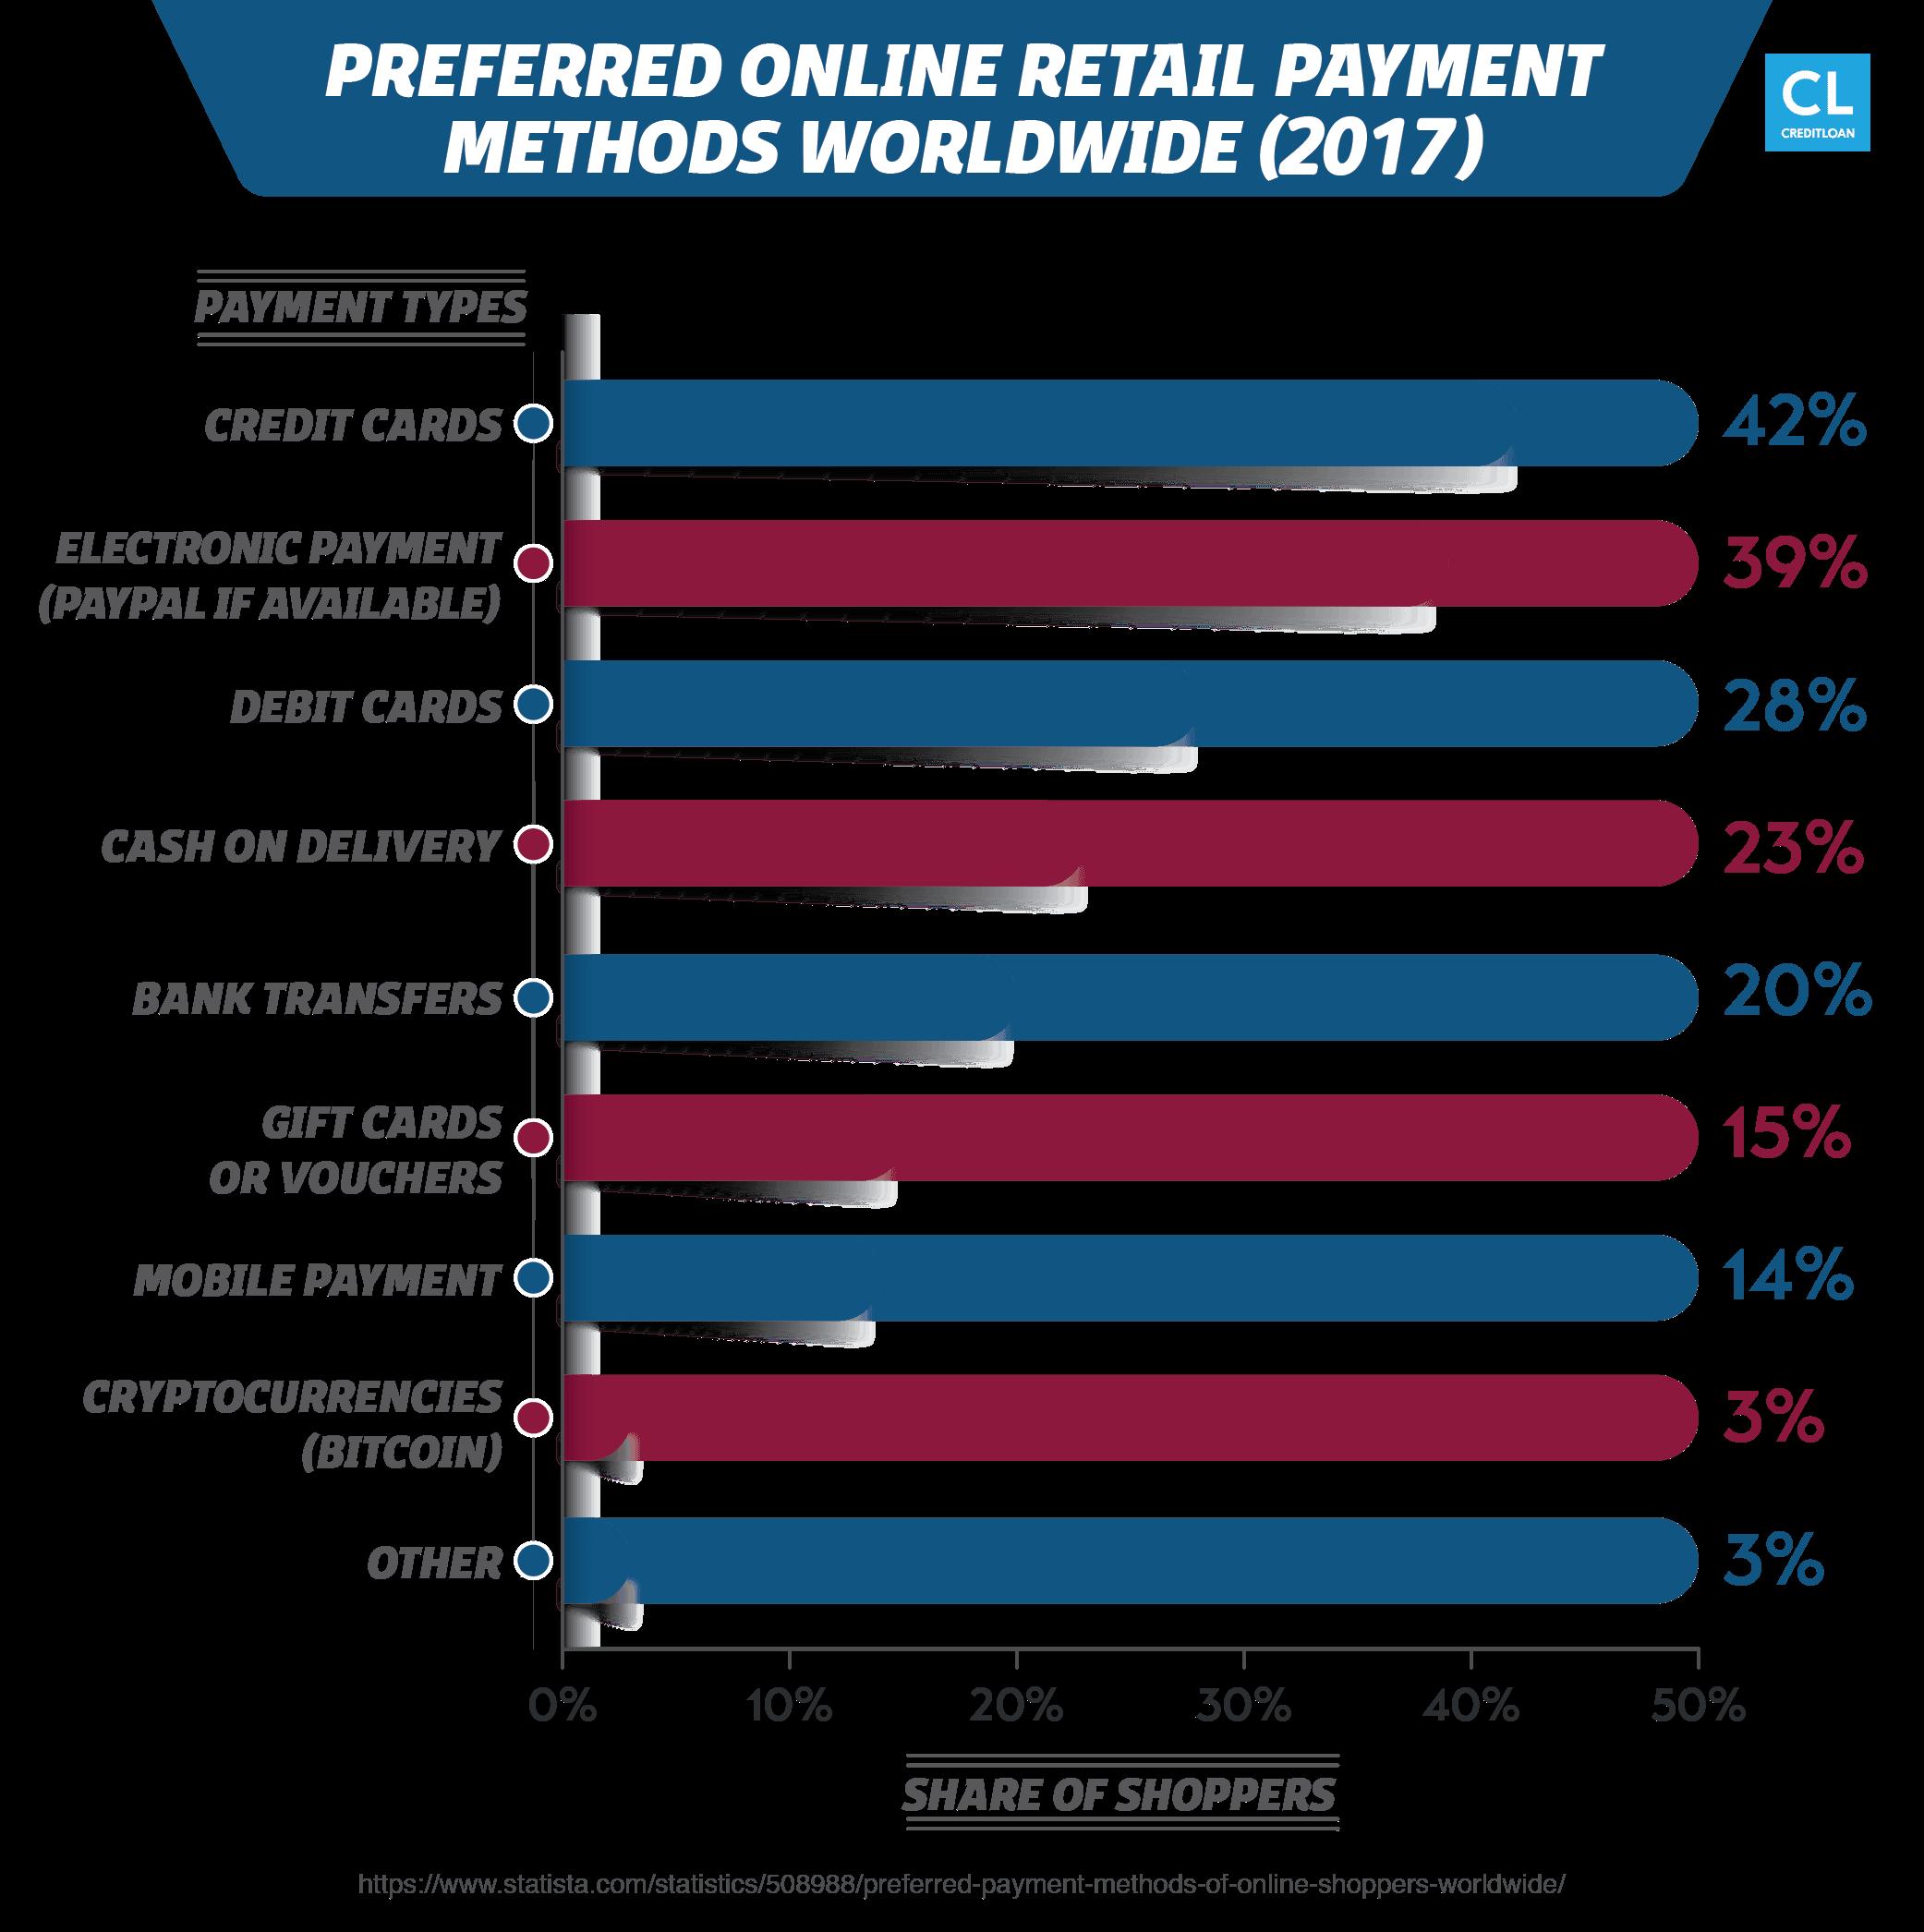 Preferred Online Retail Payment Methods Worldwide 2017